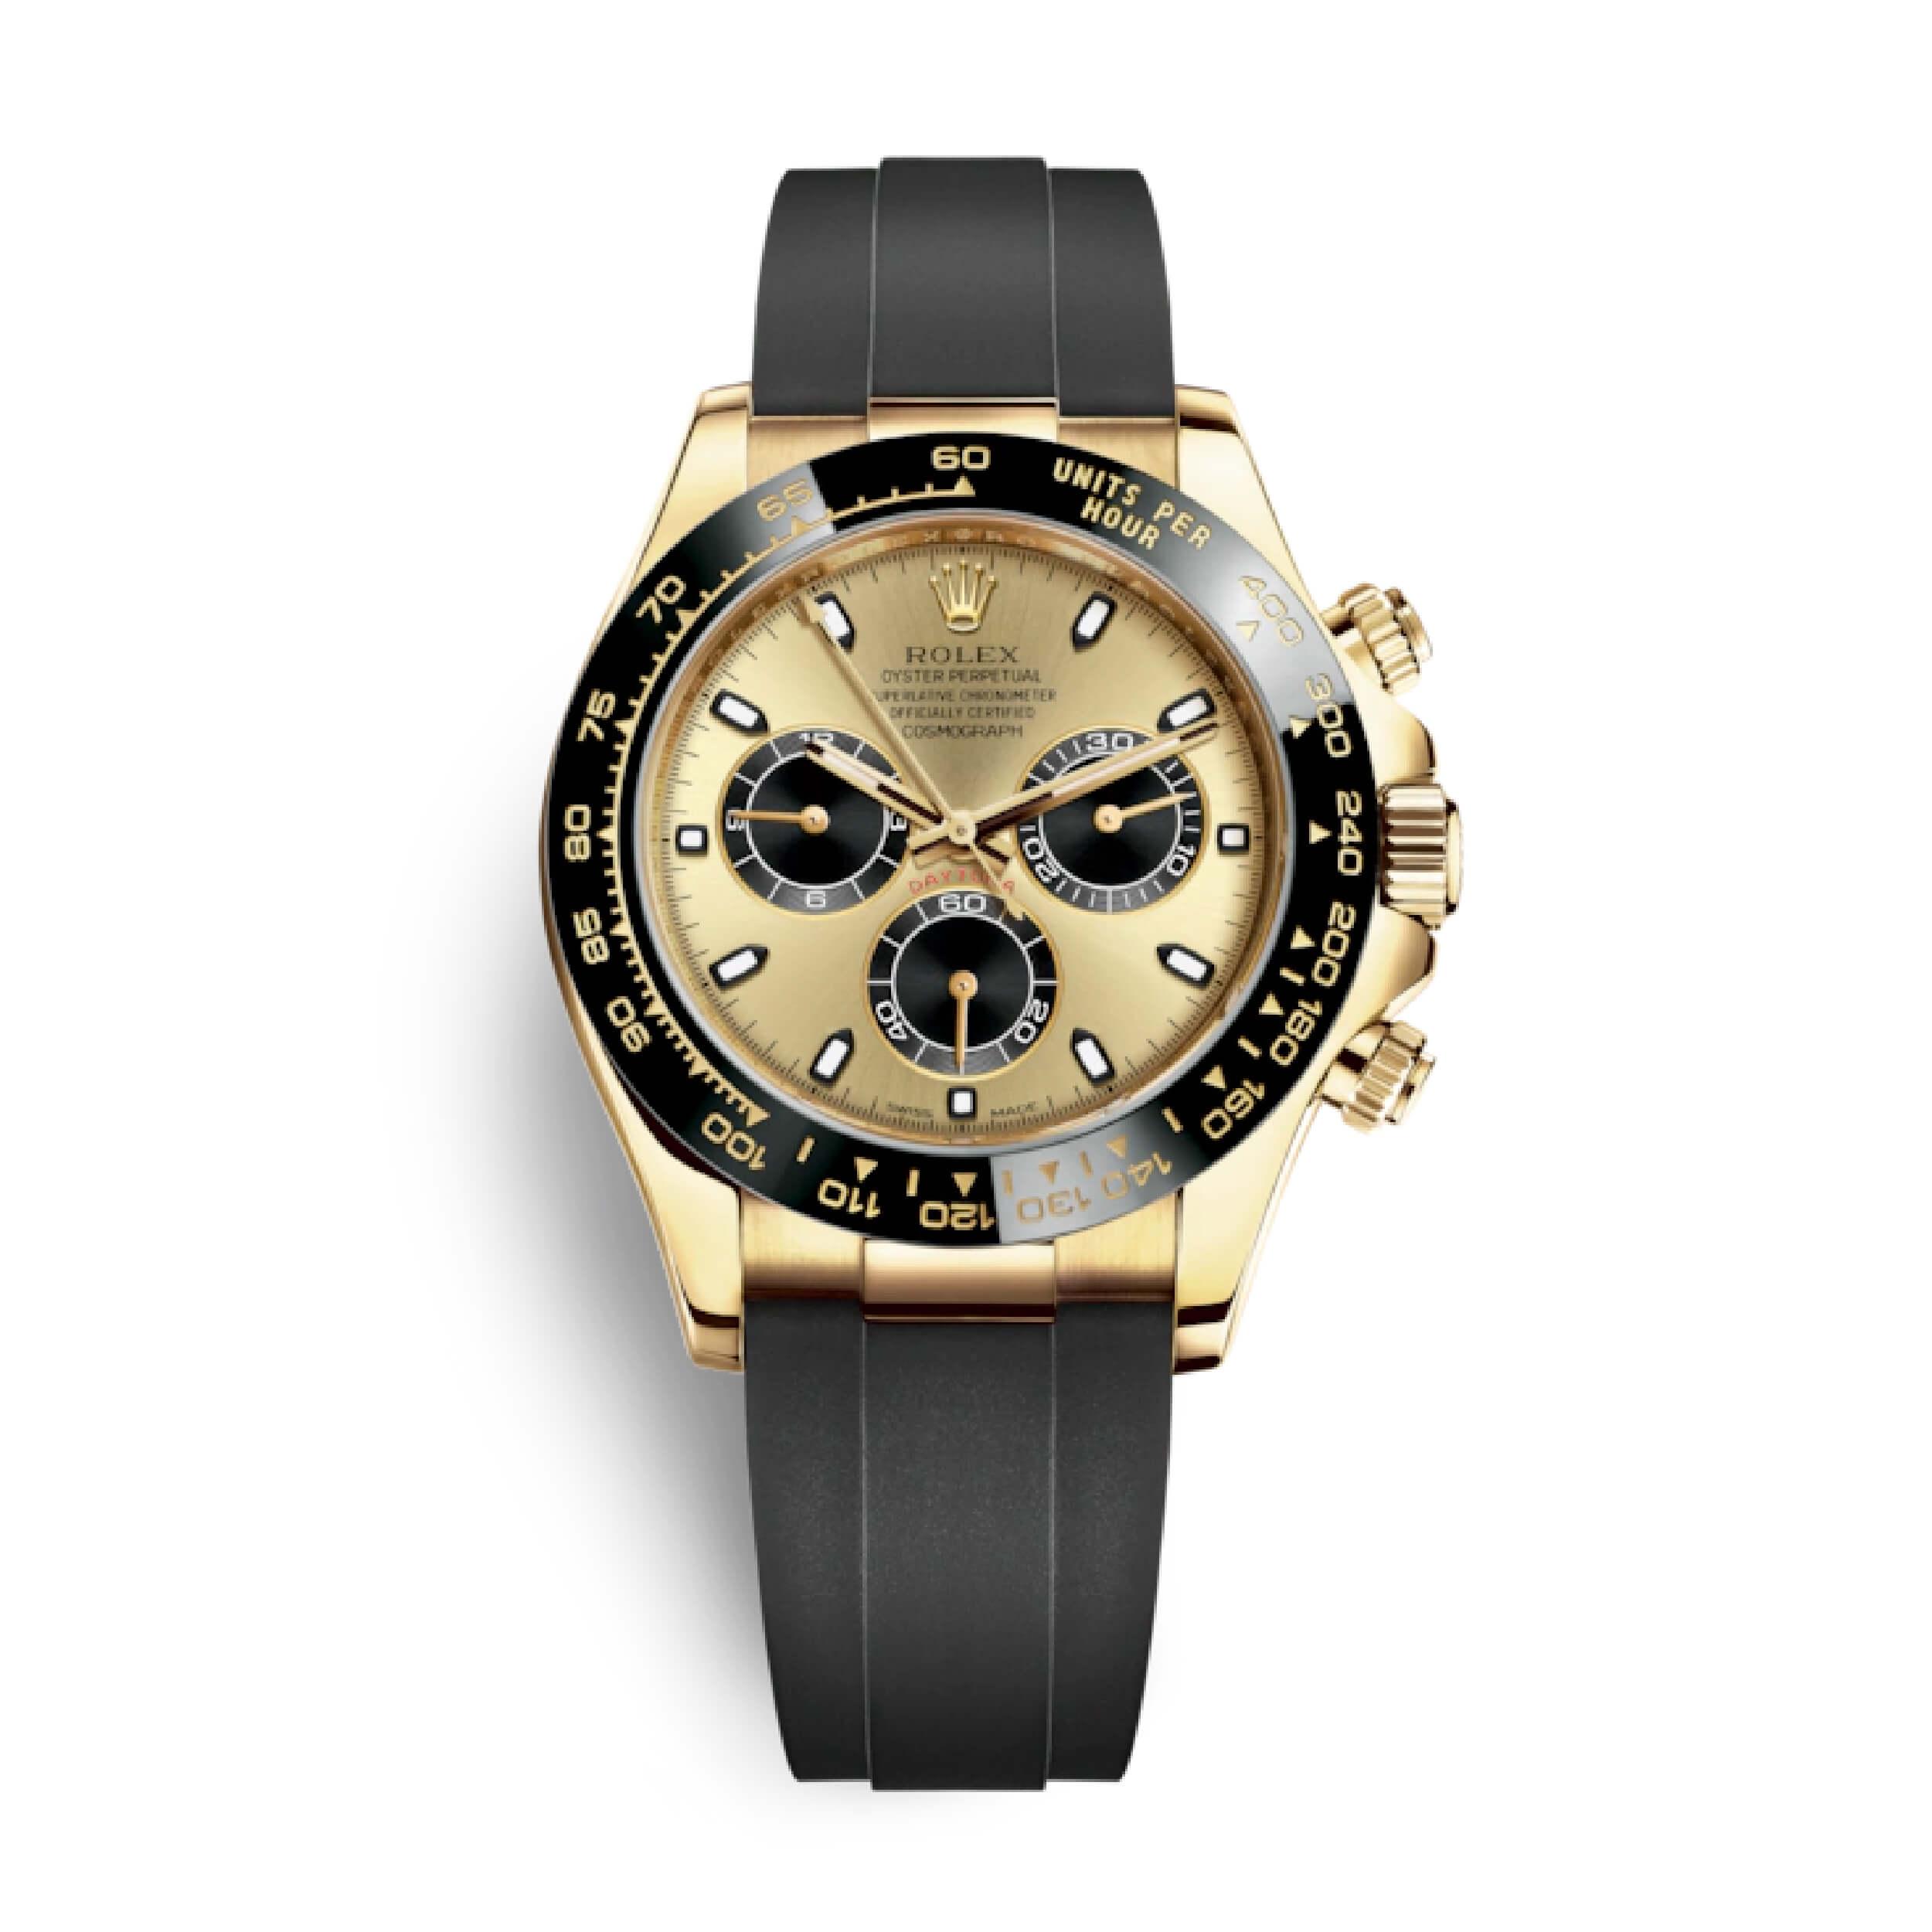 Rolex Cosmograph Daytona | Best Luxury Chronograph Watches 2021